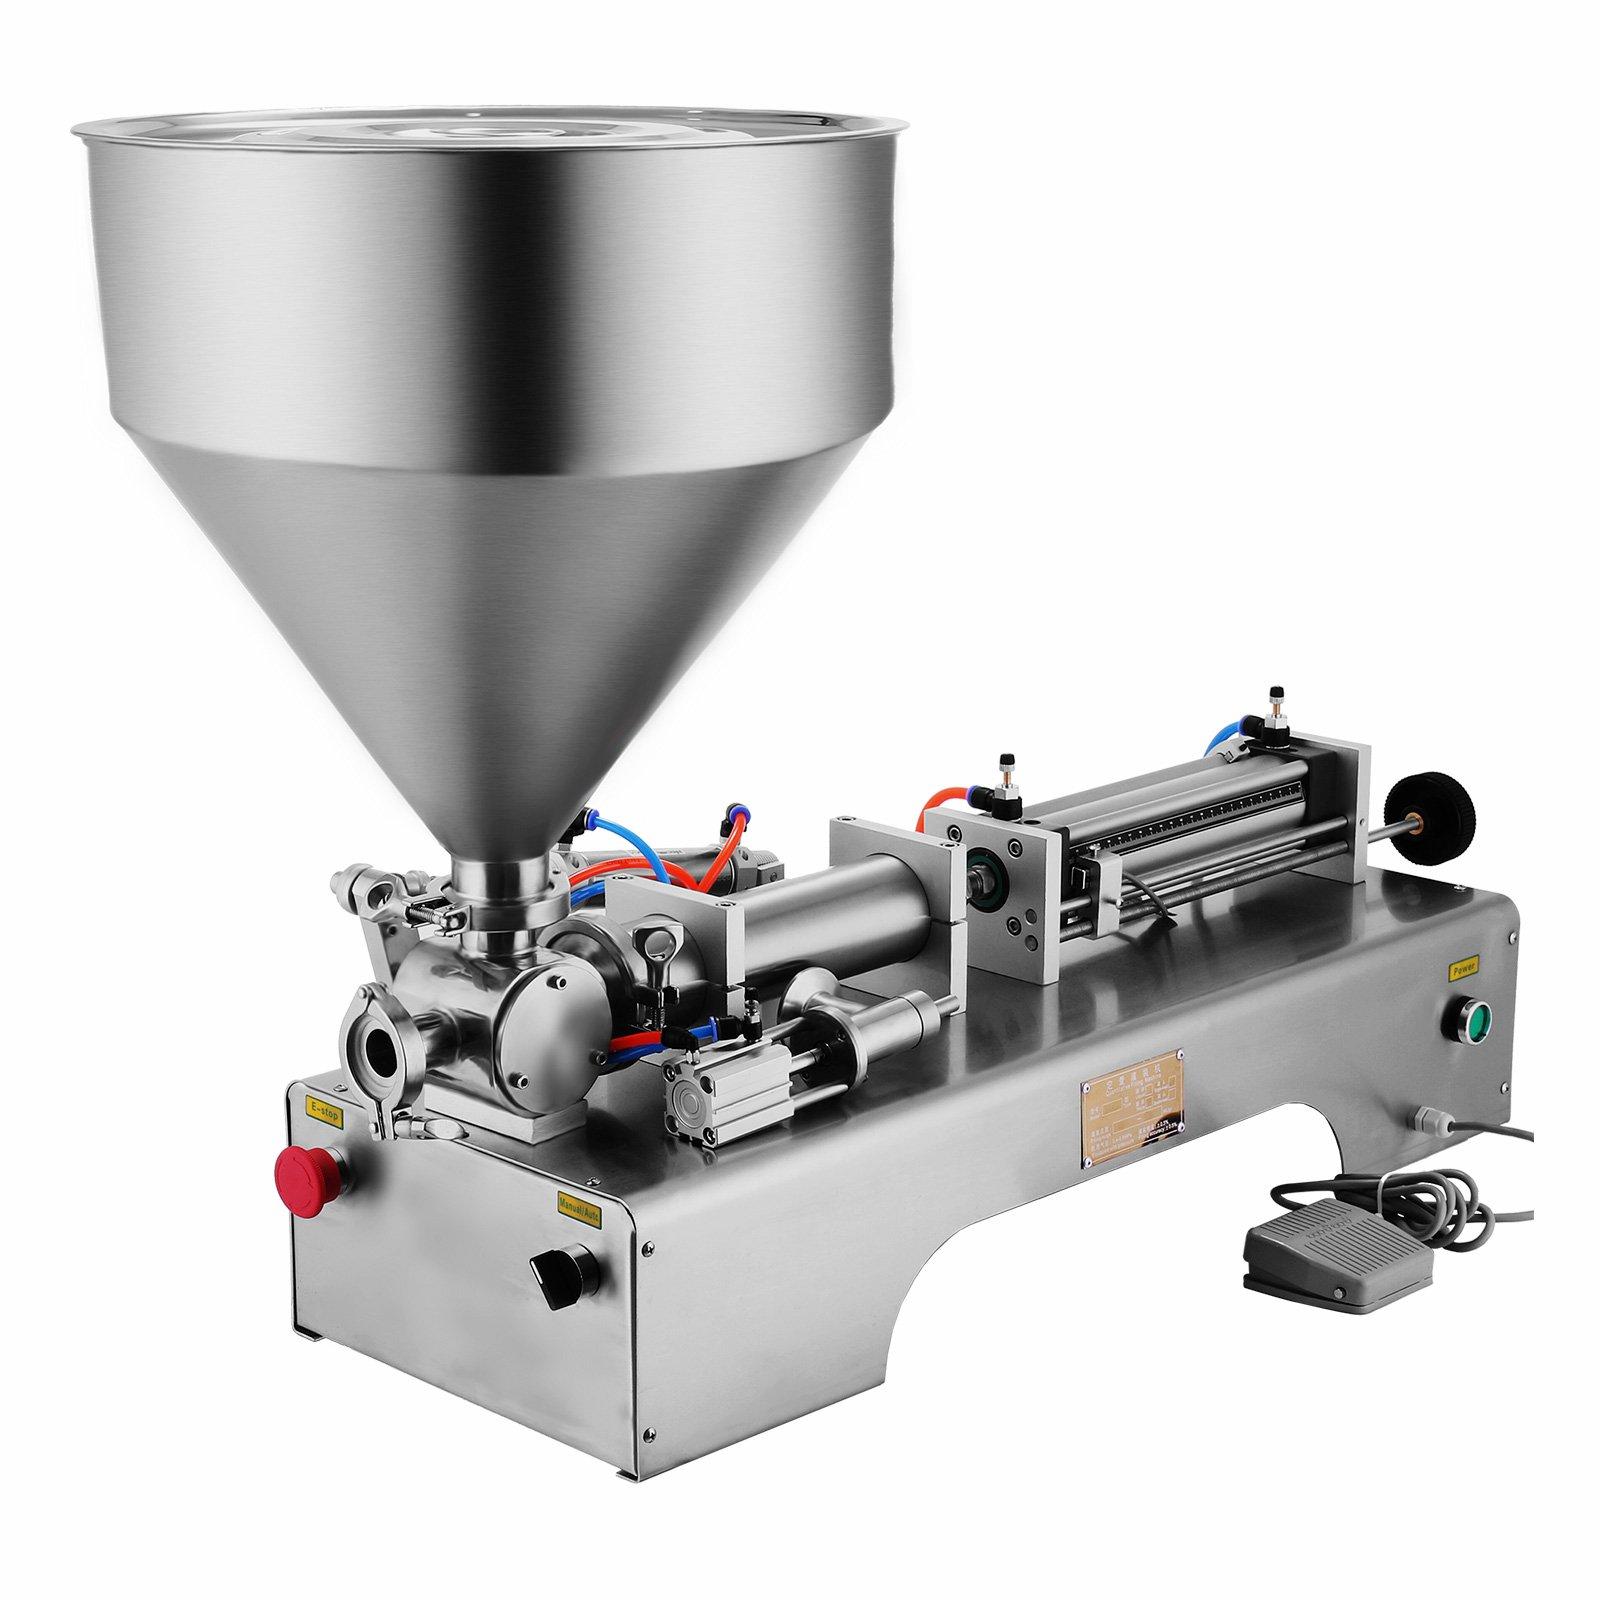 Happybuy 50-500ML Pneumatic Liquid Filling Machine 5-25 bottles /min Horizontal Semi-auto Liquid Paste Filling Machine with 30L Funnel for Liquid Paste Oil Cream Shampoo (50-500ML with Funnel)